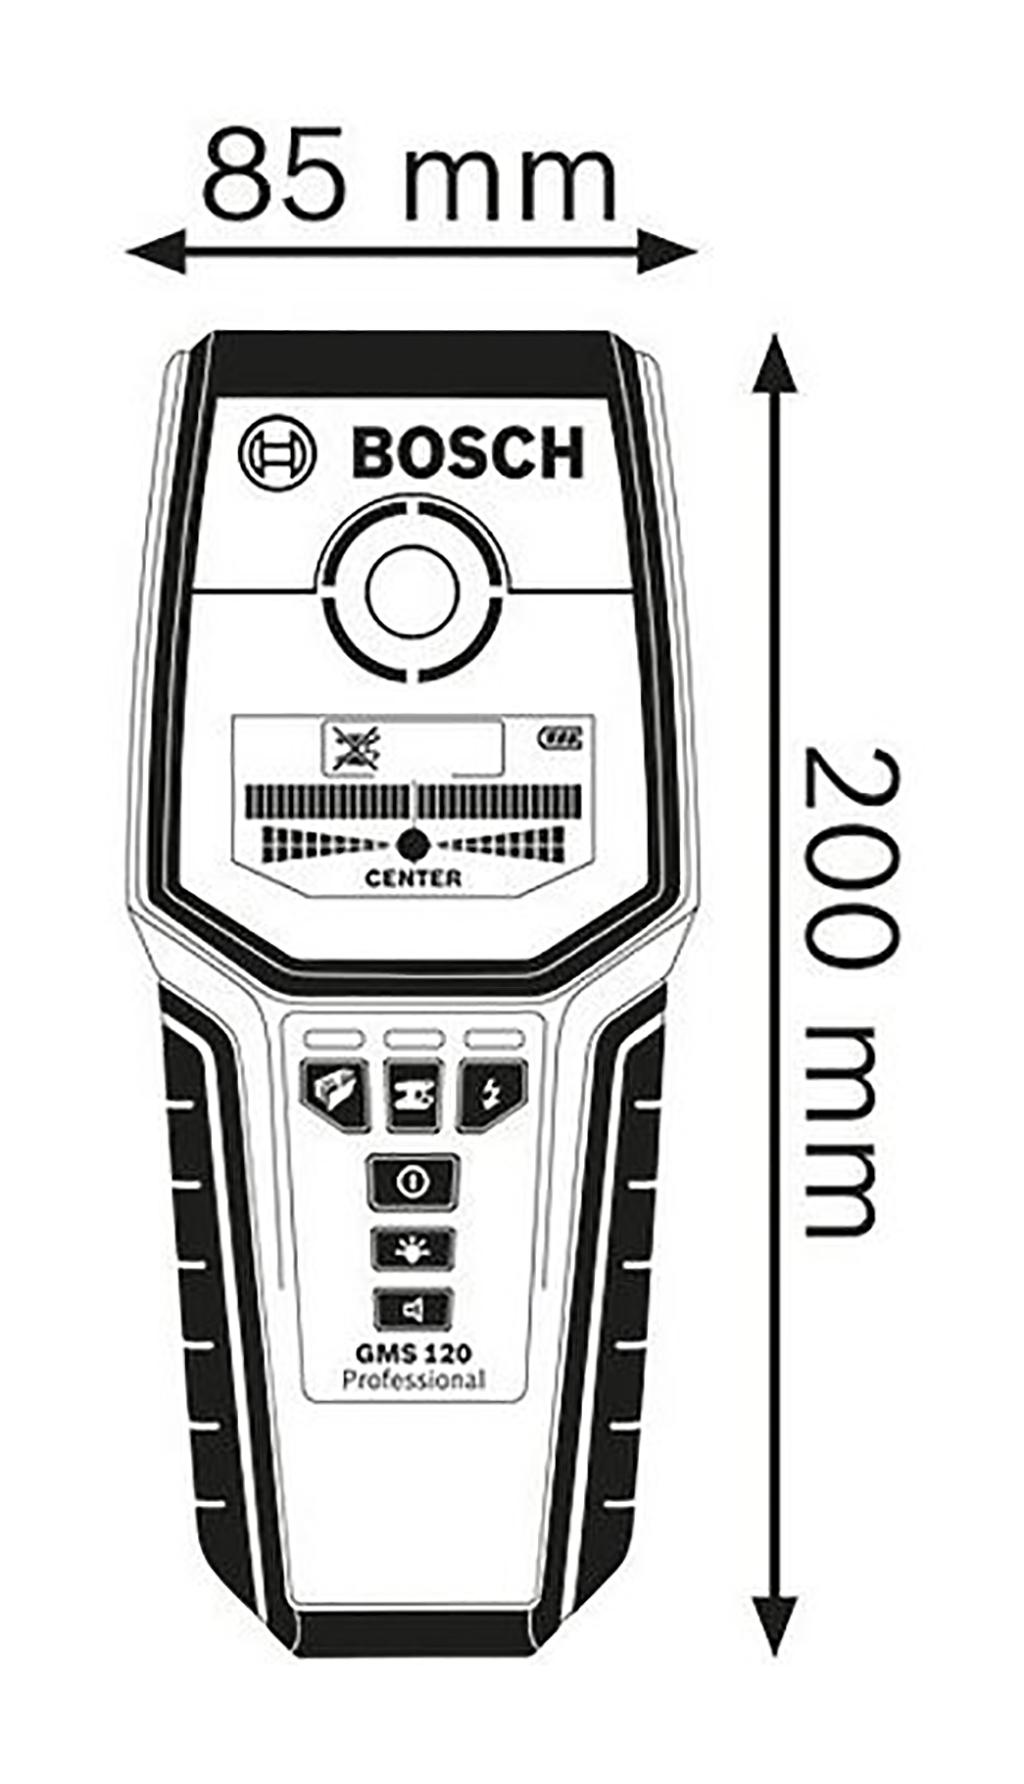 Description photo 1 of BOSCH GMS 120 DETECTOR<br>BOSCH GMS 120 ម៉ាស៊ីនរាវរក